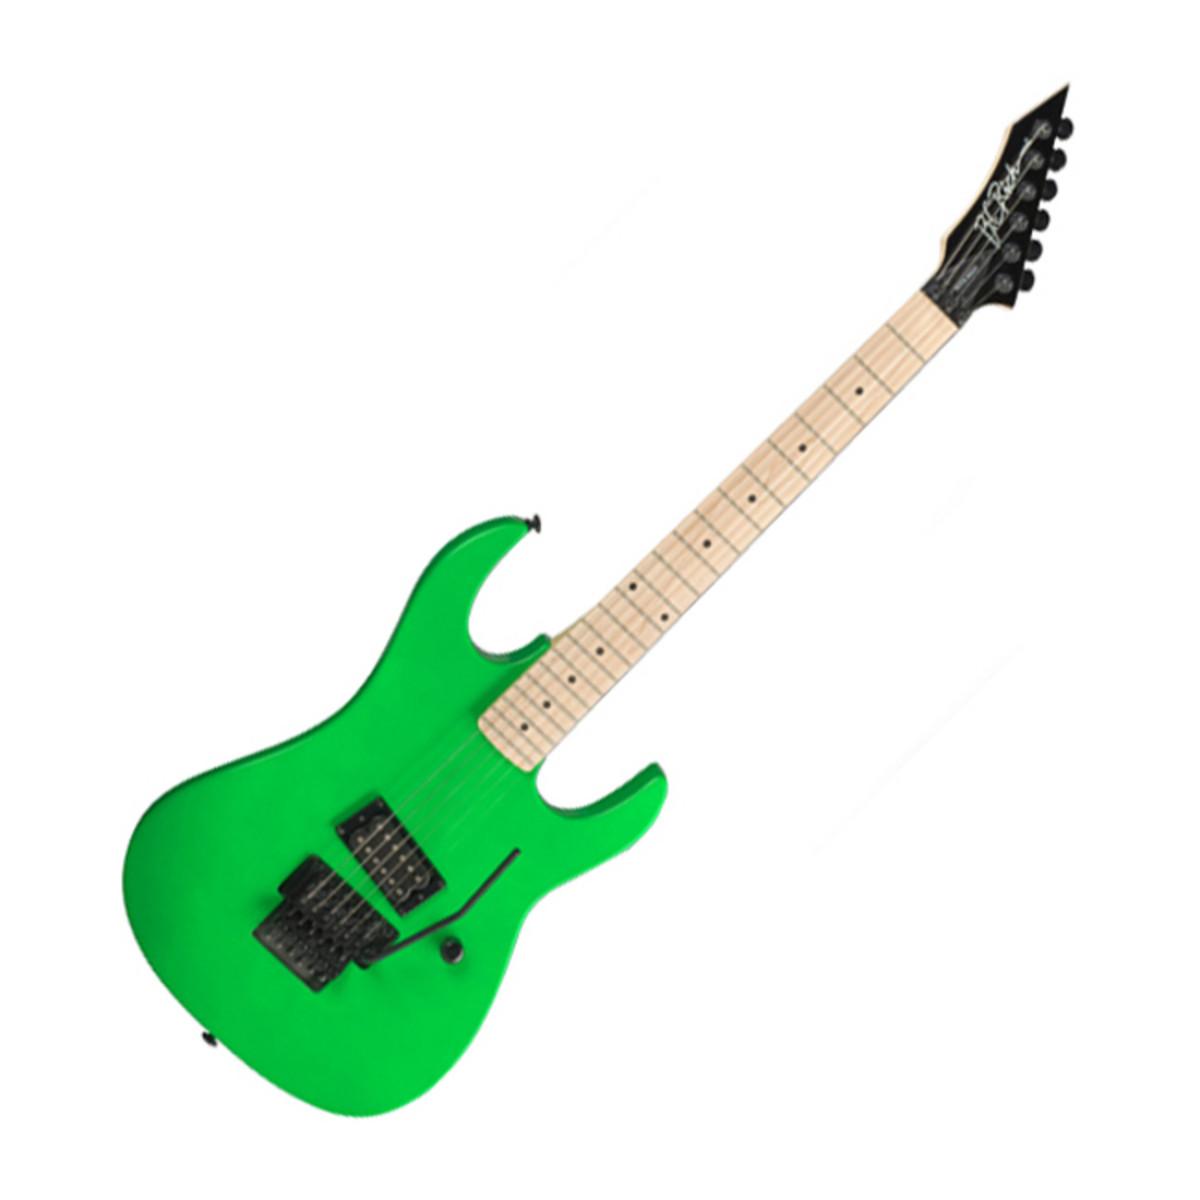 bc rich gunslinger gunslinger guitare retro n on vert b. Black Bedroom Furniture Sets. Home Design Ideas